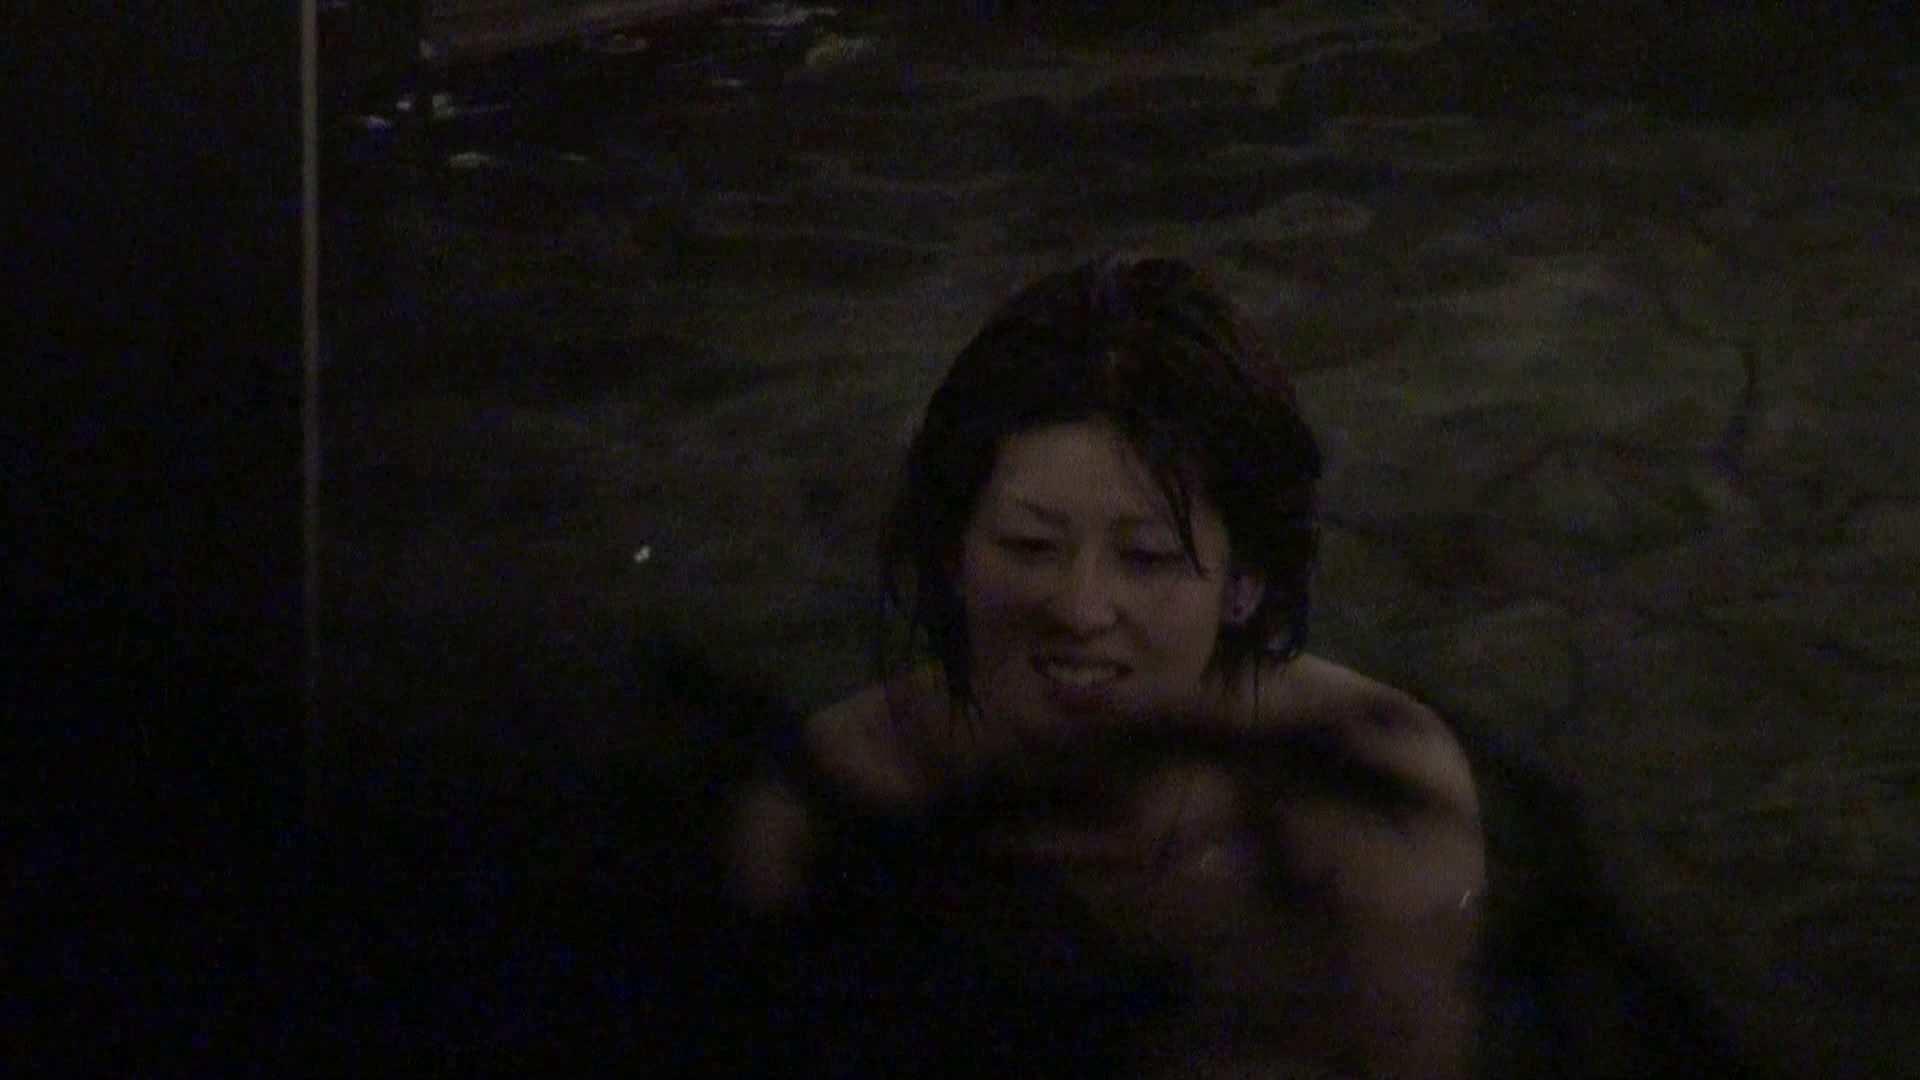 Aquaな露天風呂Vol.376 盗撮 おまんこ動画流出 109連発 26